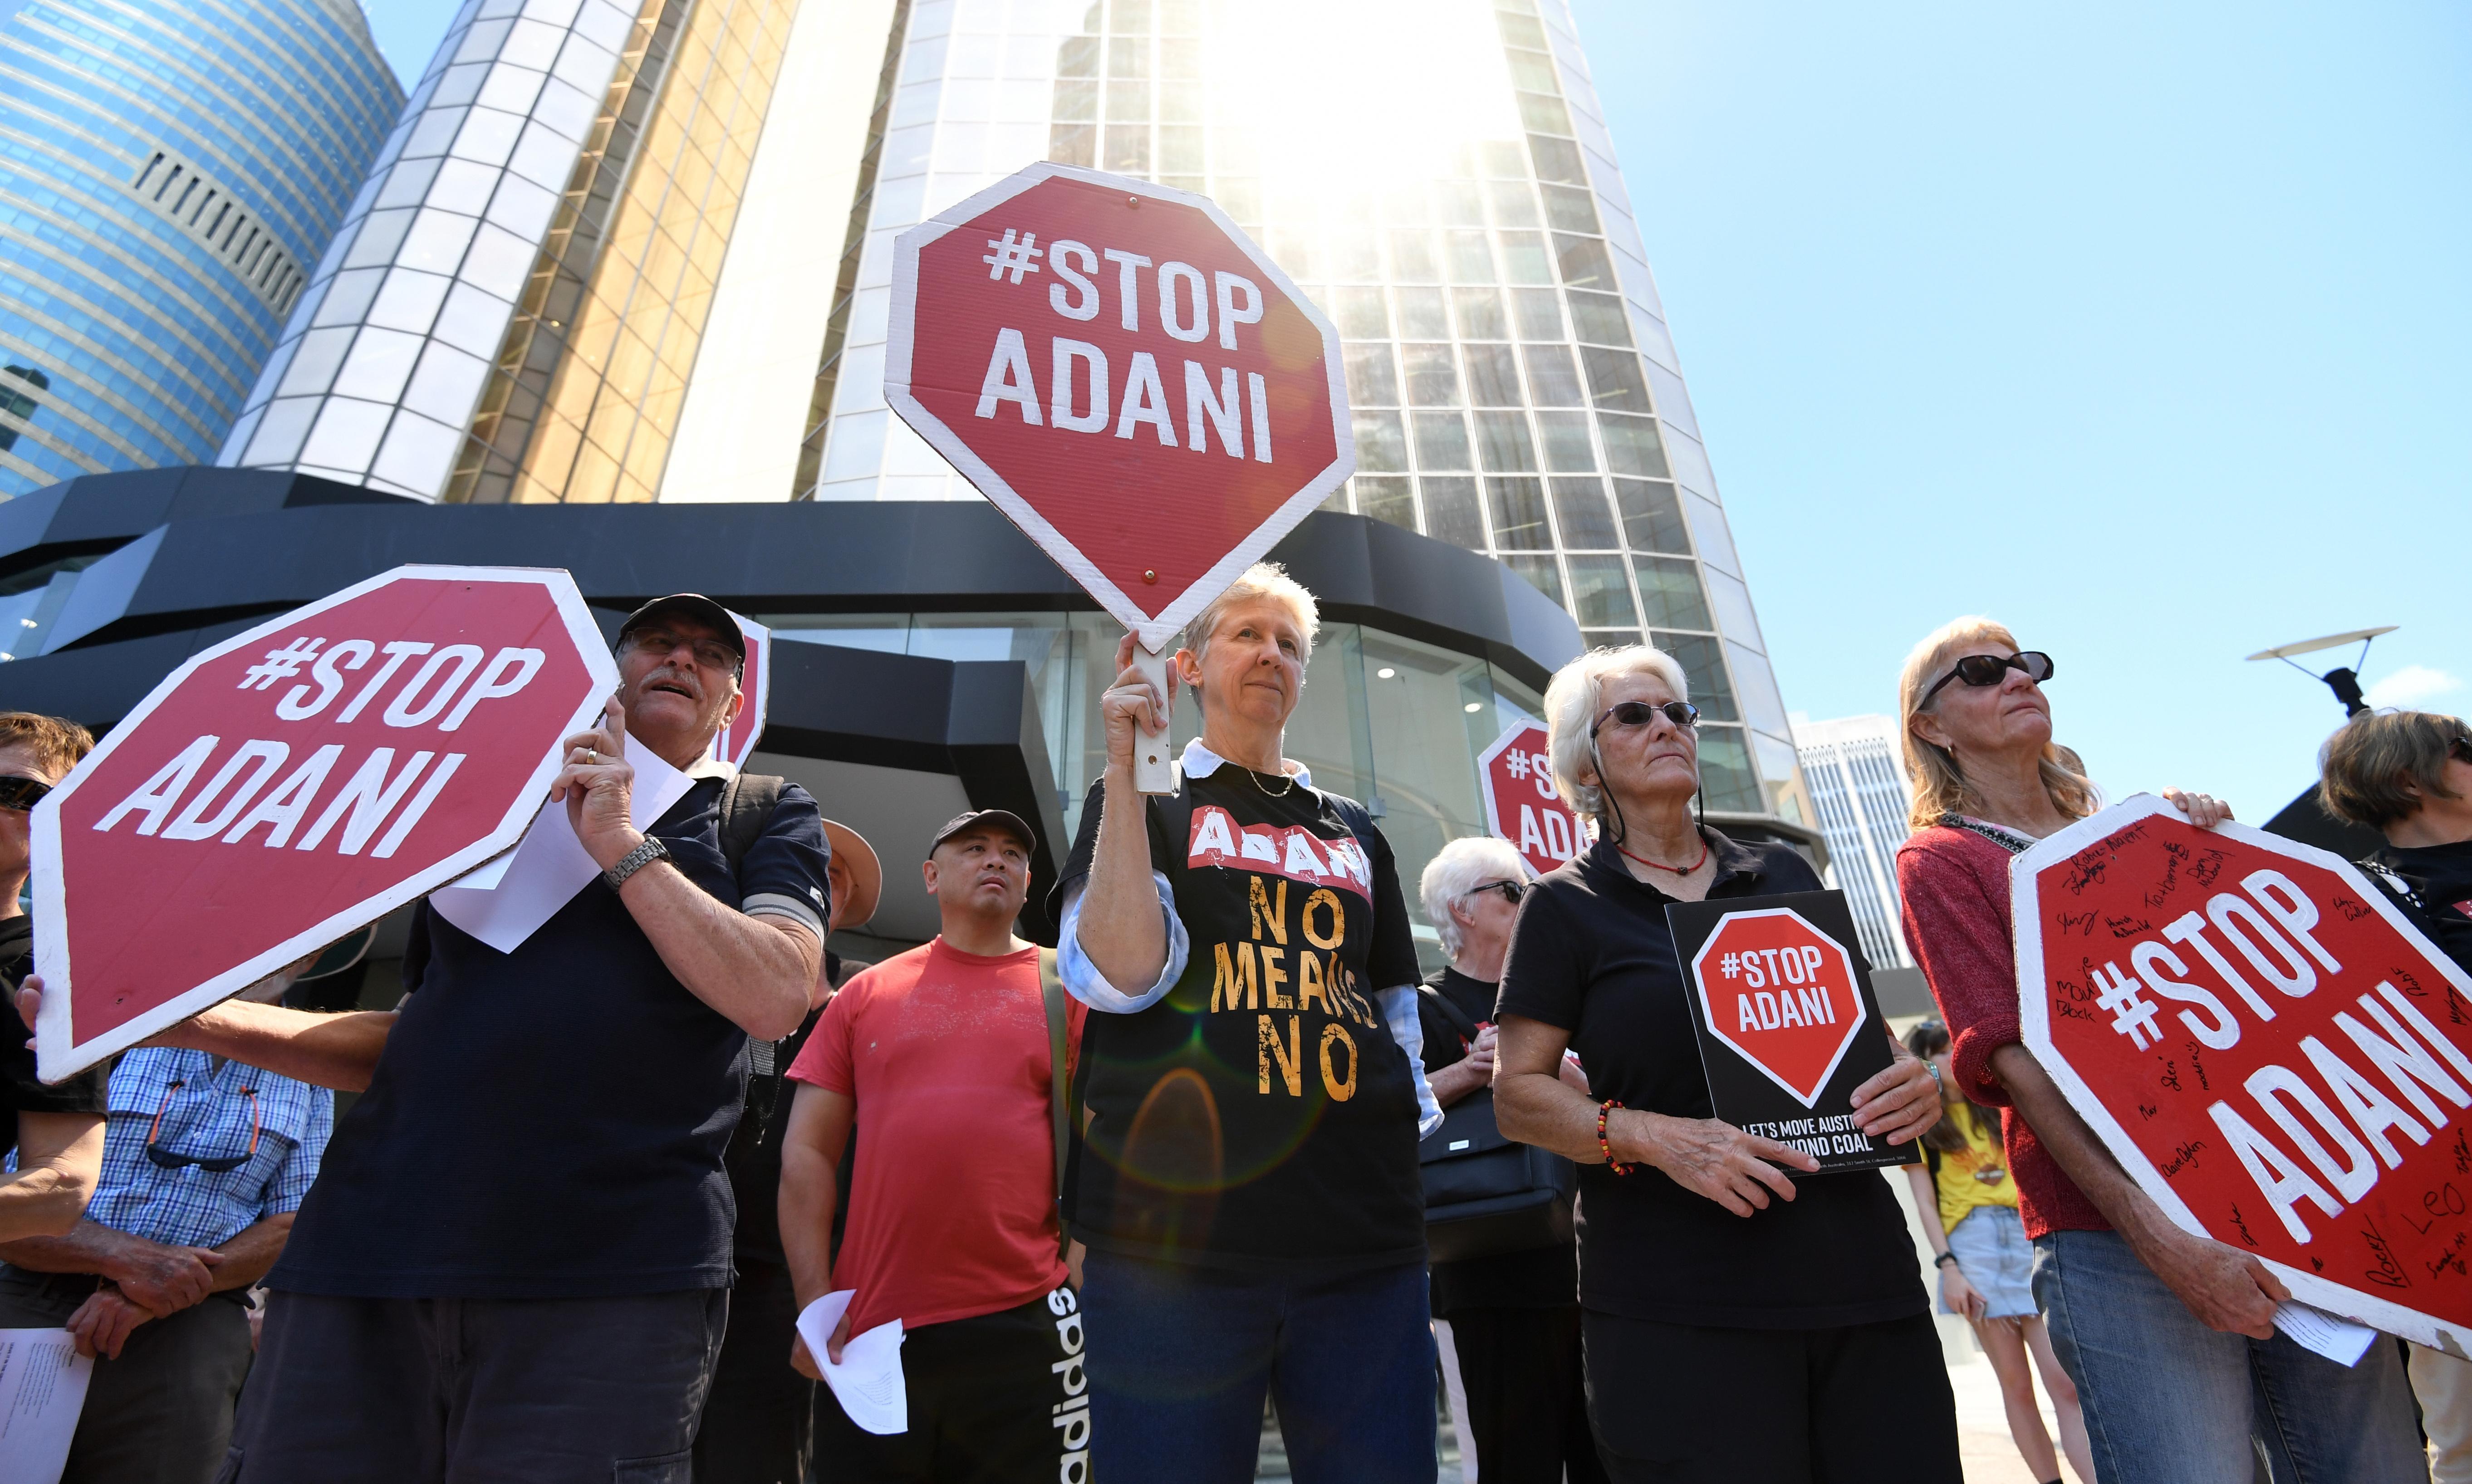 Adani coalmine: Axis Capital withdraws bid to insure Carmichael rail line